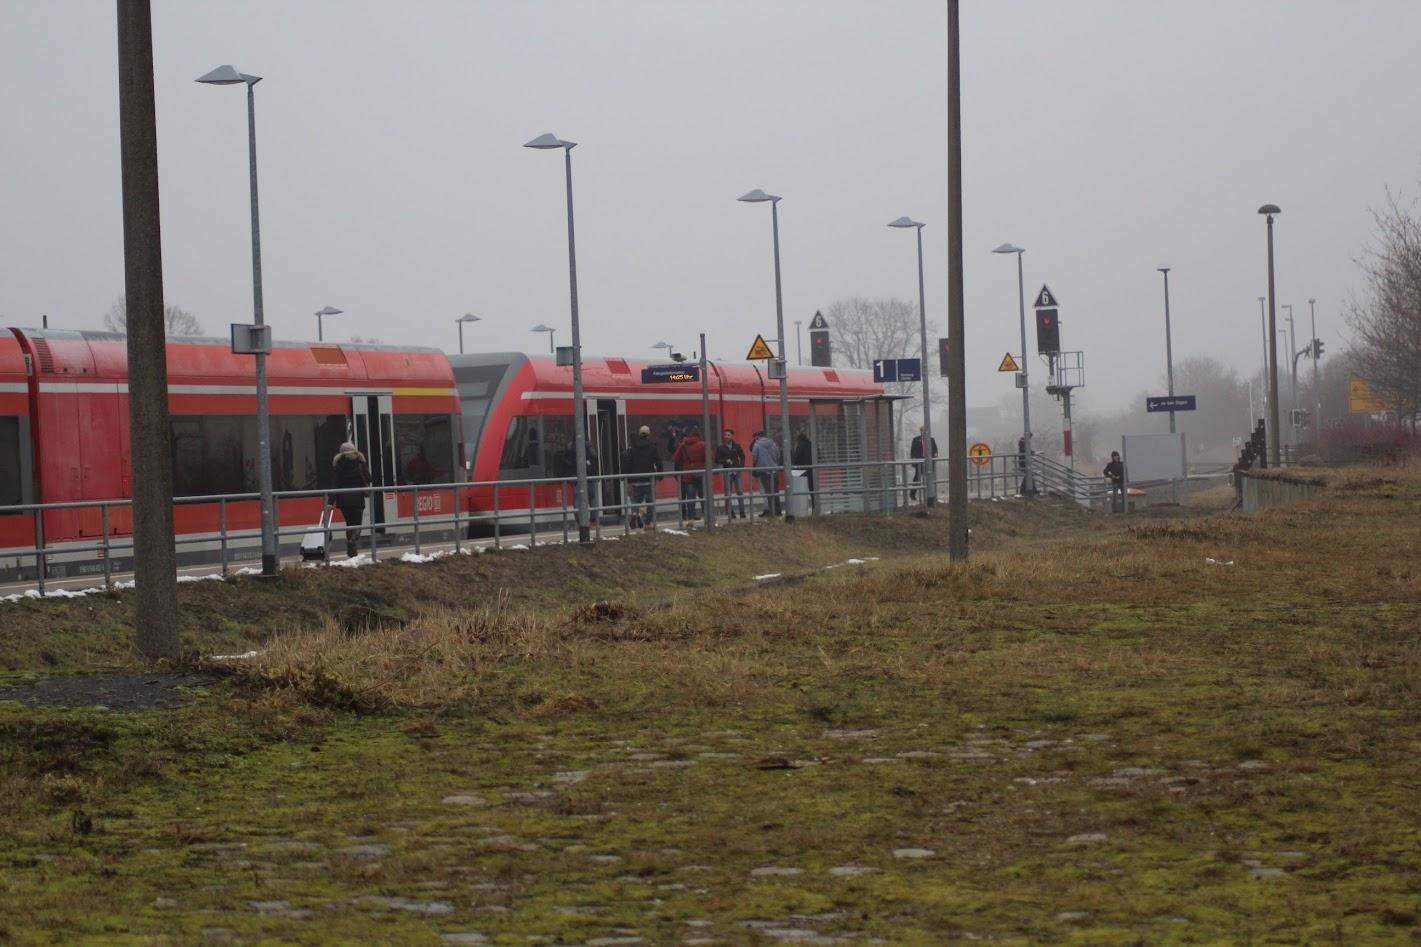 Bahnhof Tantow (Bild Archiv A.M.)